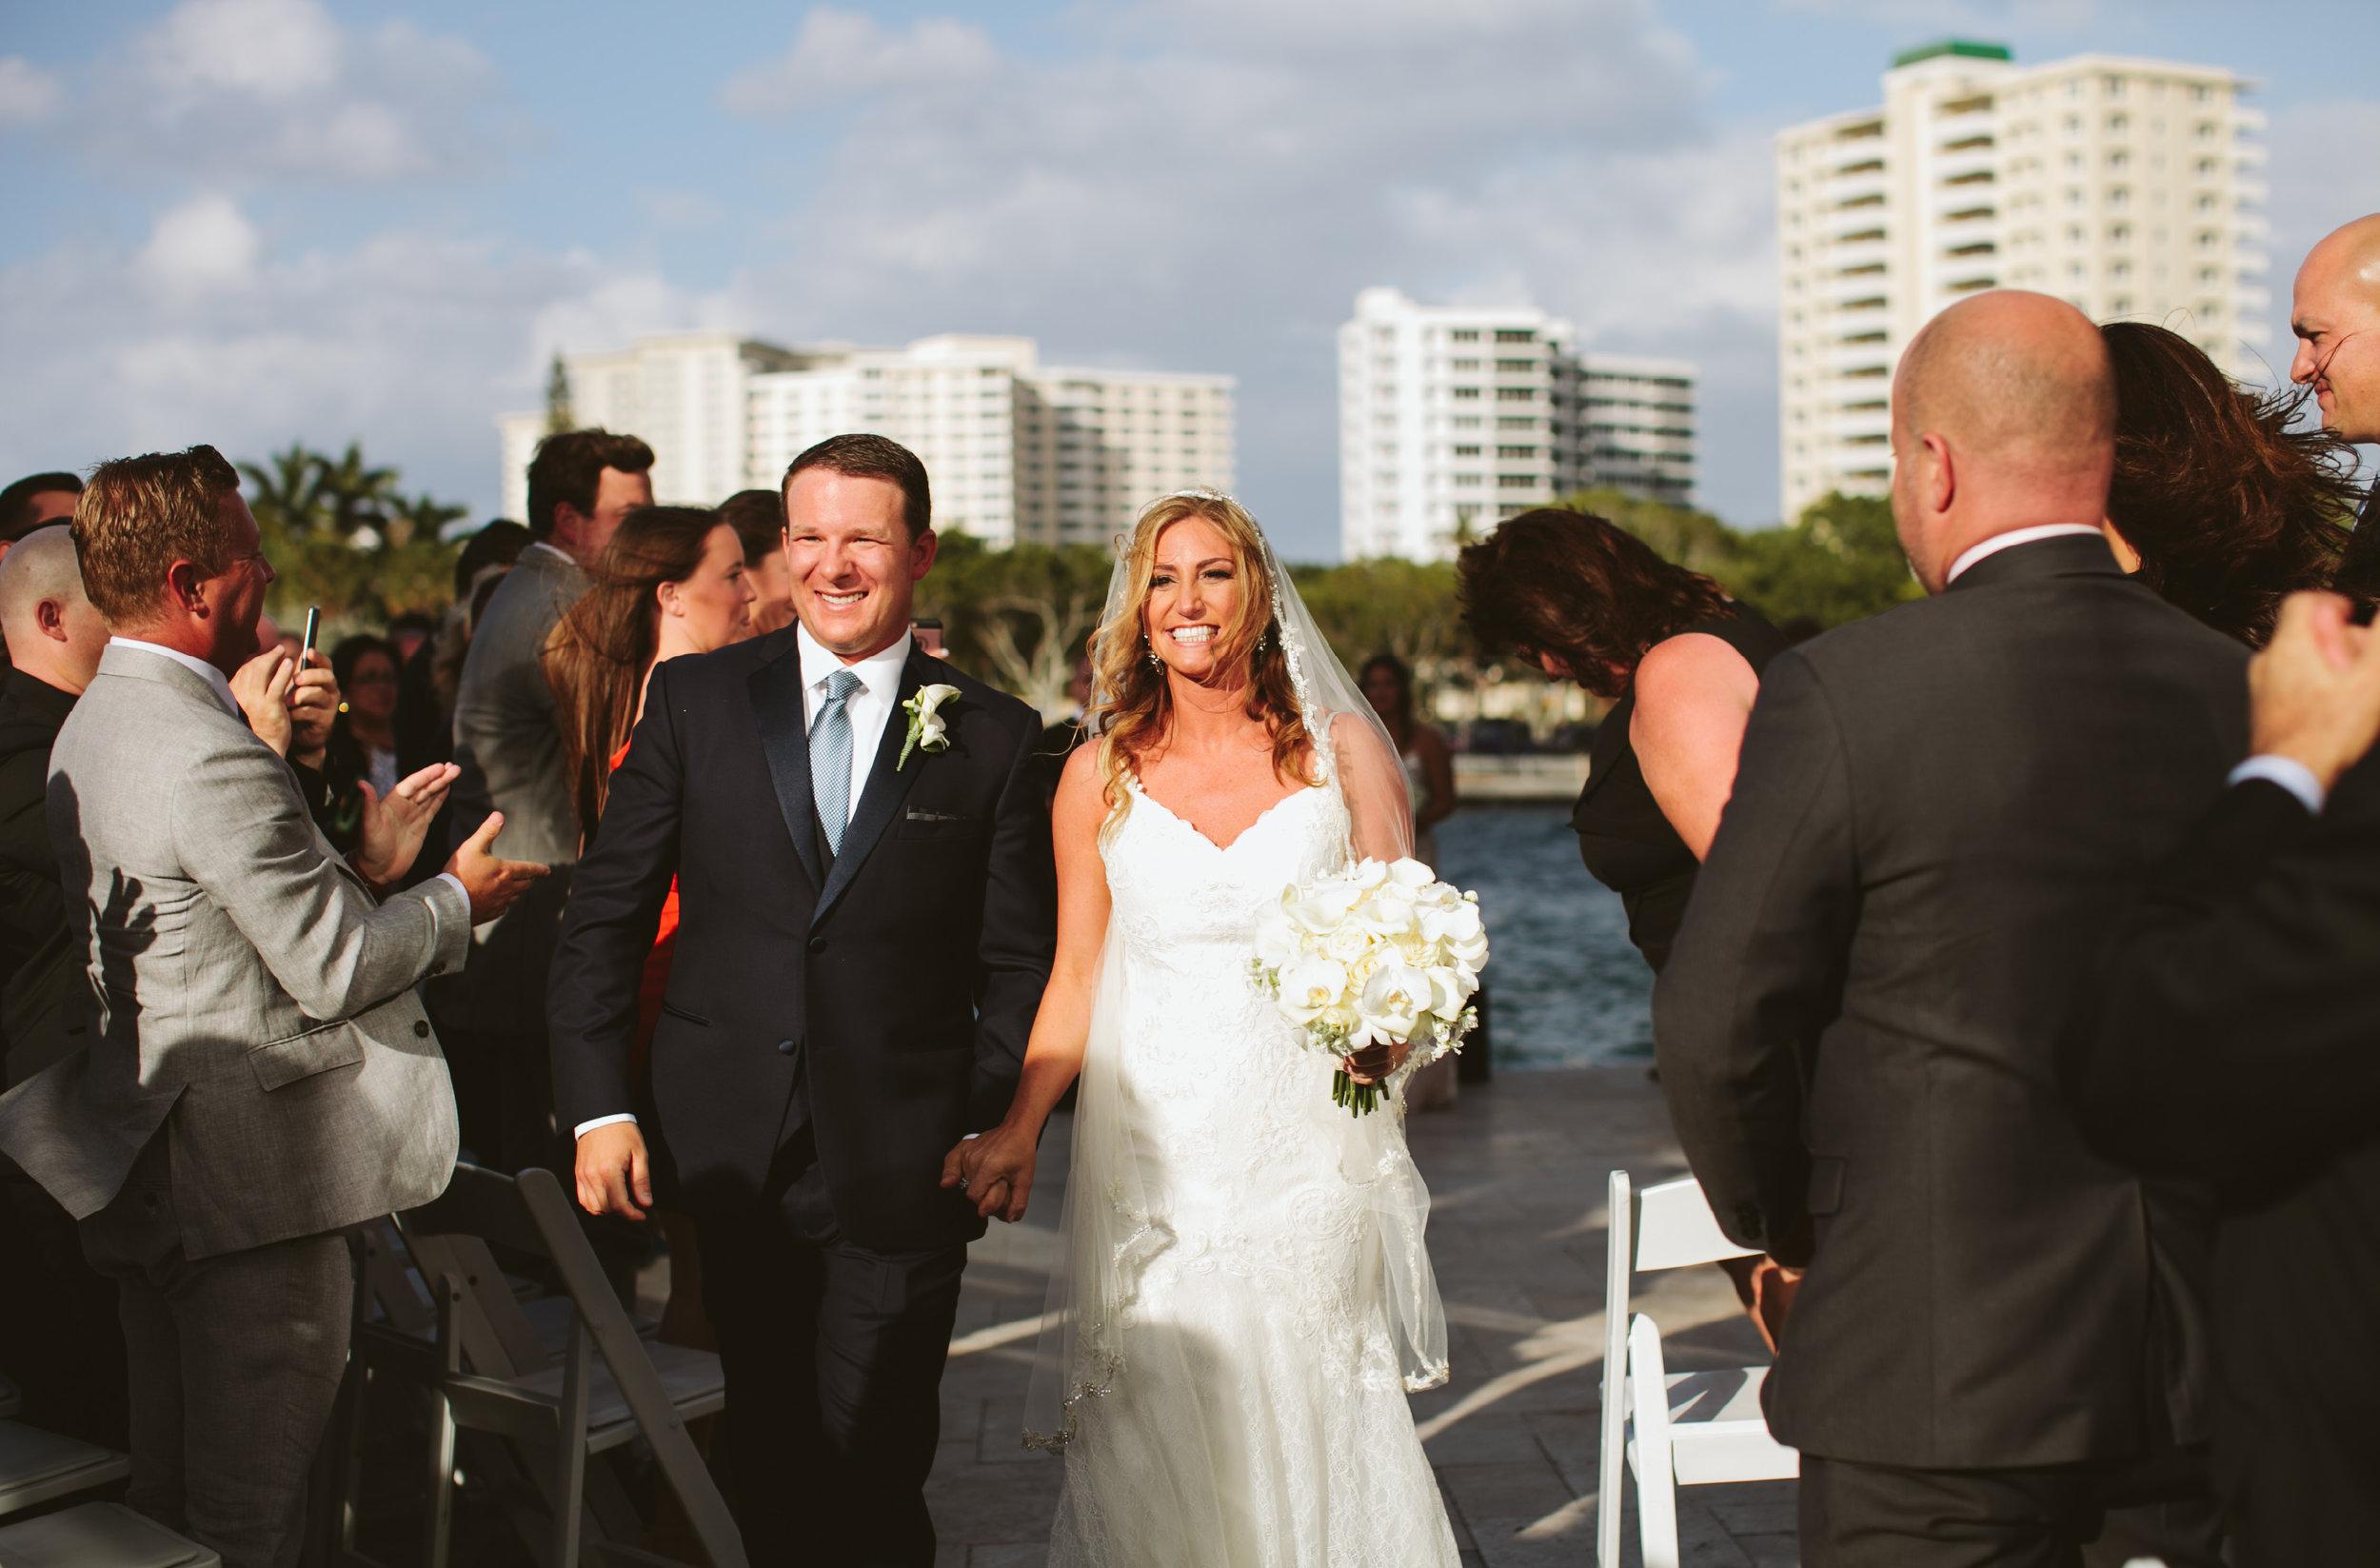 Kim + John's Wedding at the Waterstone Hotel in Boca Raton56.jpg